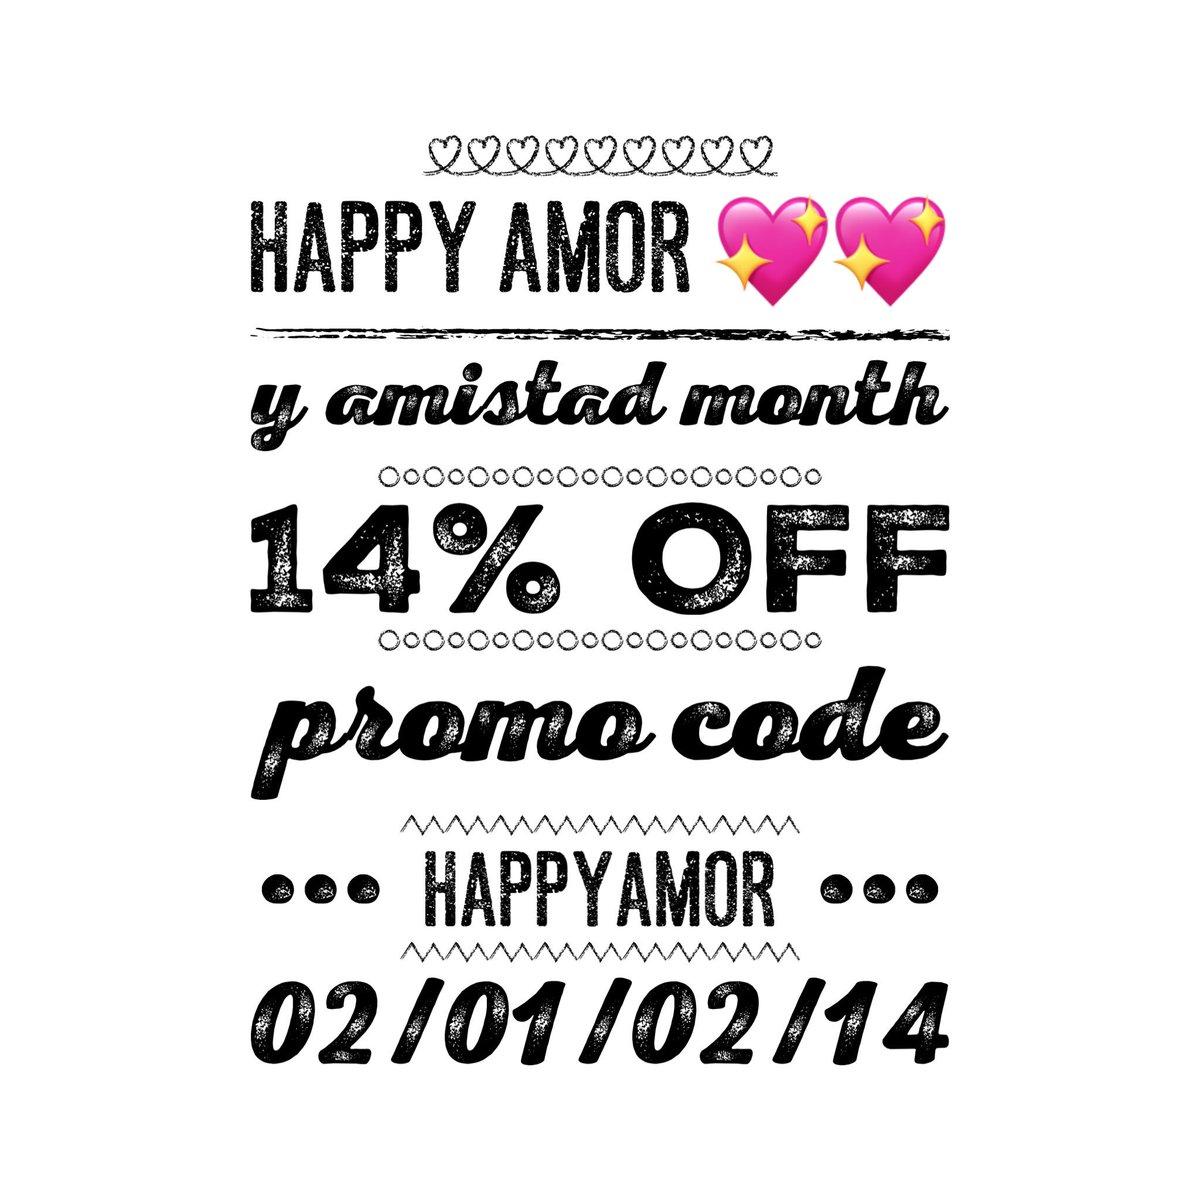 Amor-Promo-Code